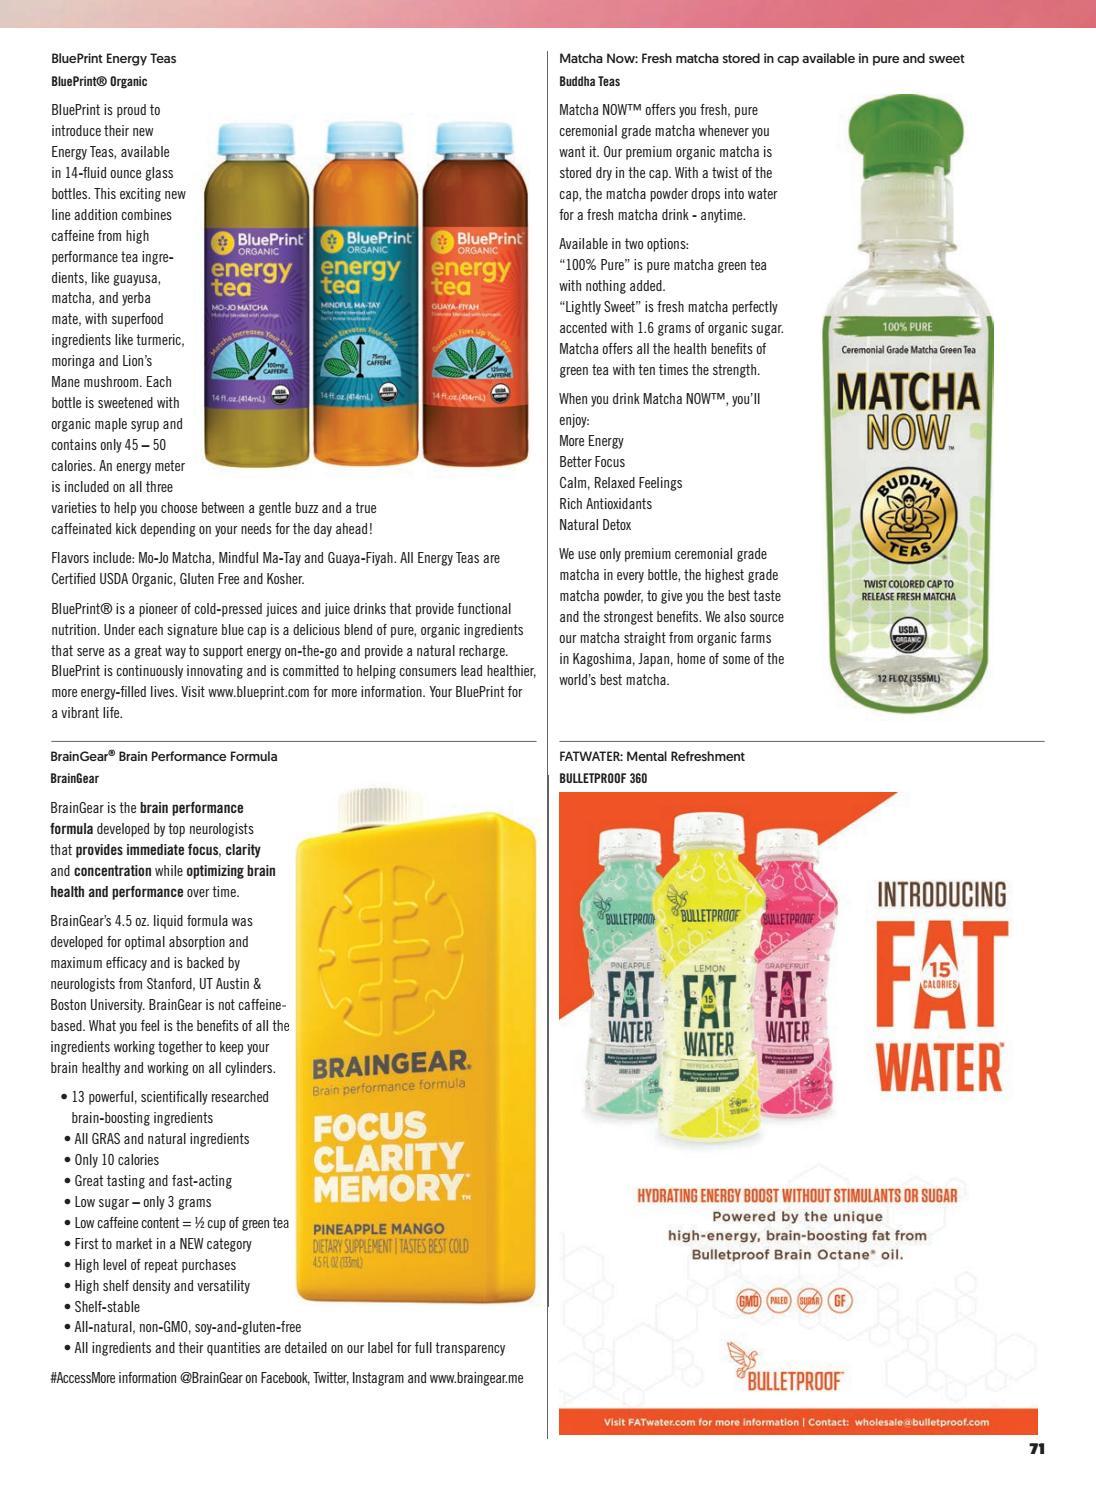 BevNET Magazine – 2017 Functional Beverage Guide by BevNET.com - issuu